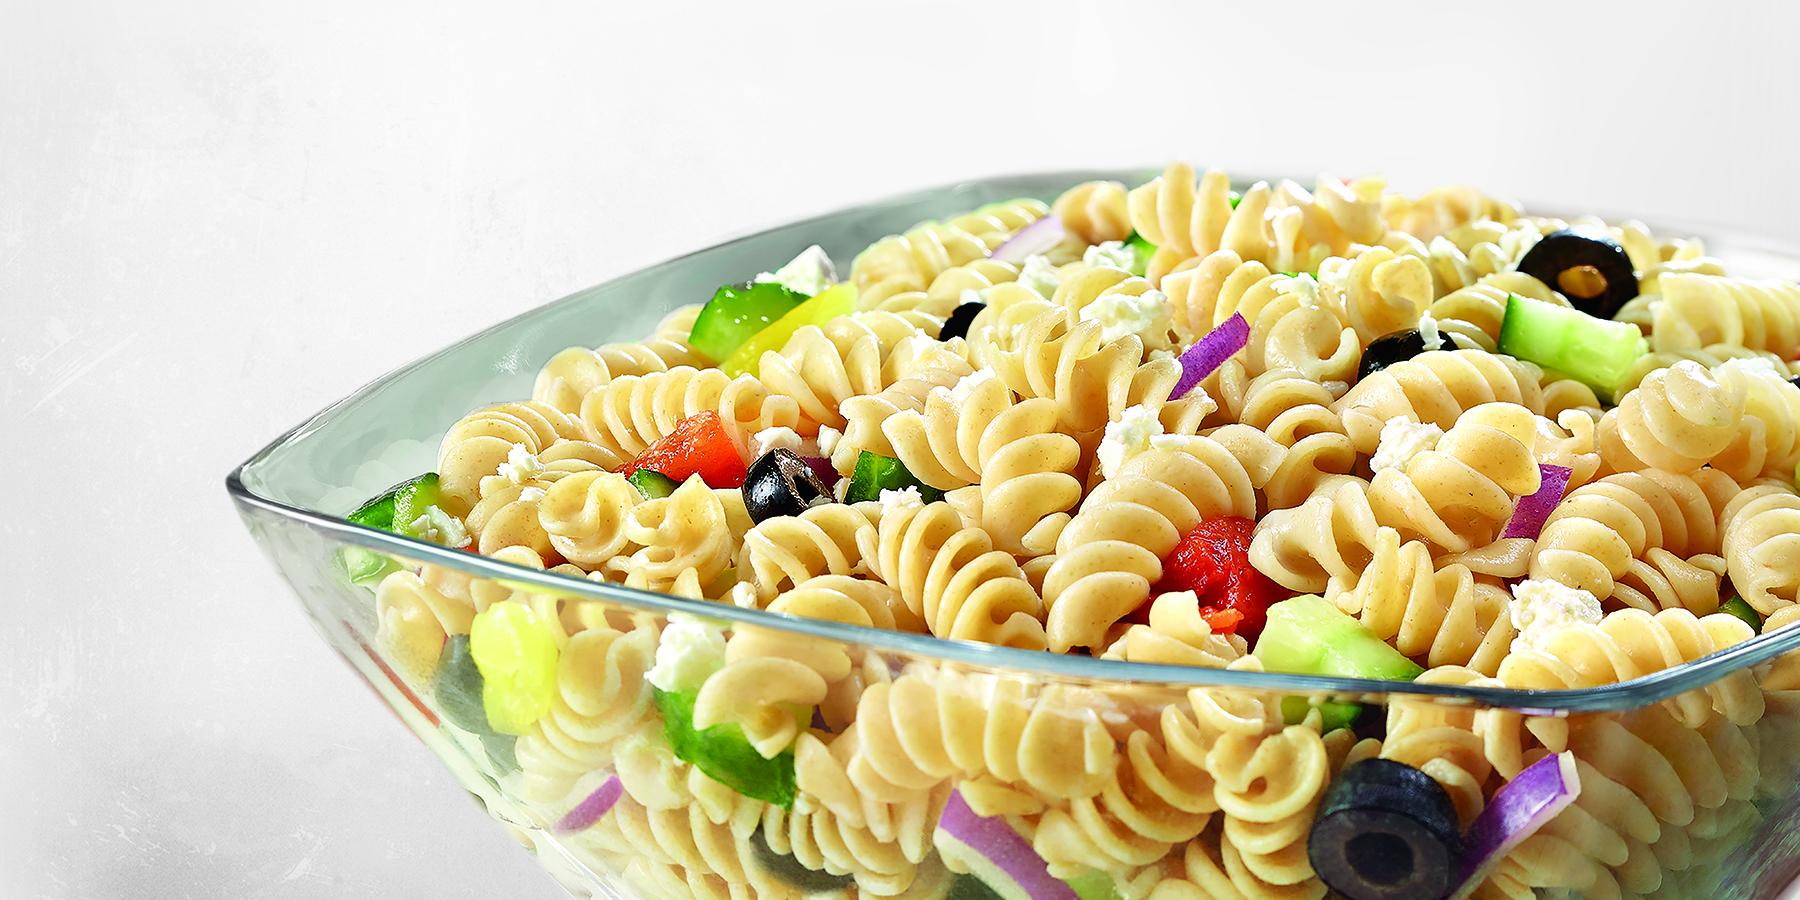 Golden Grain Greek Pasta Salad with Rotini